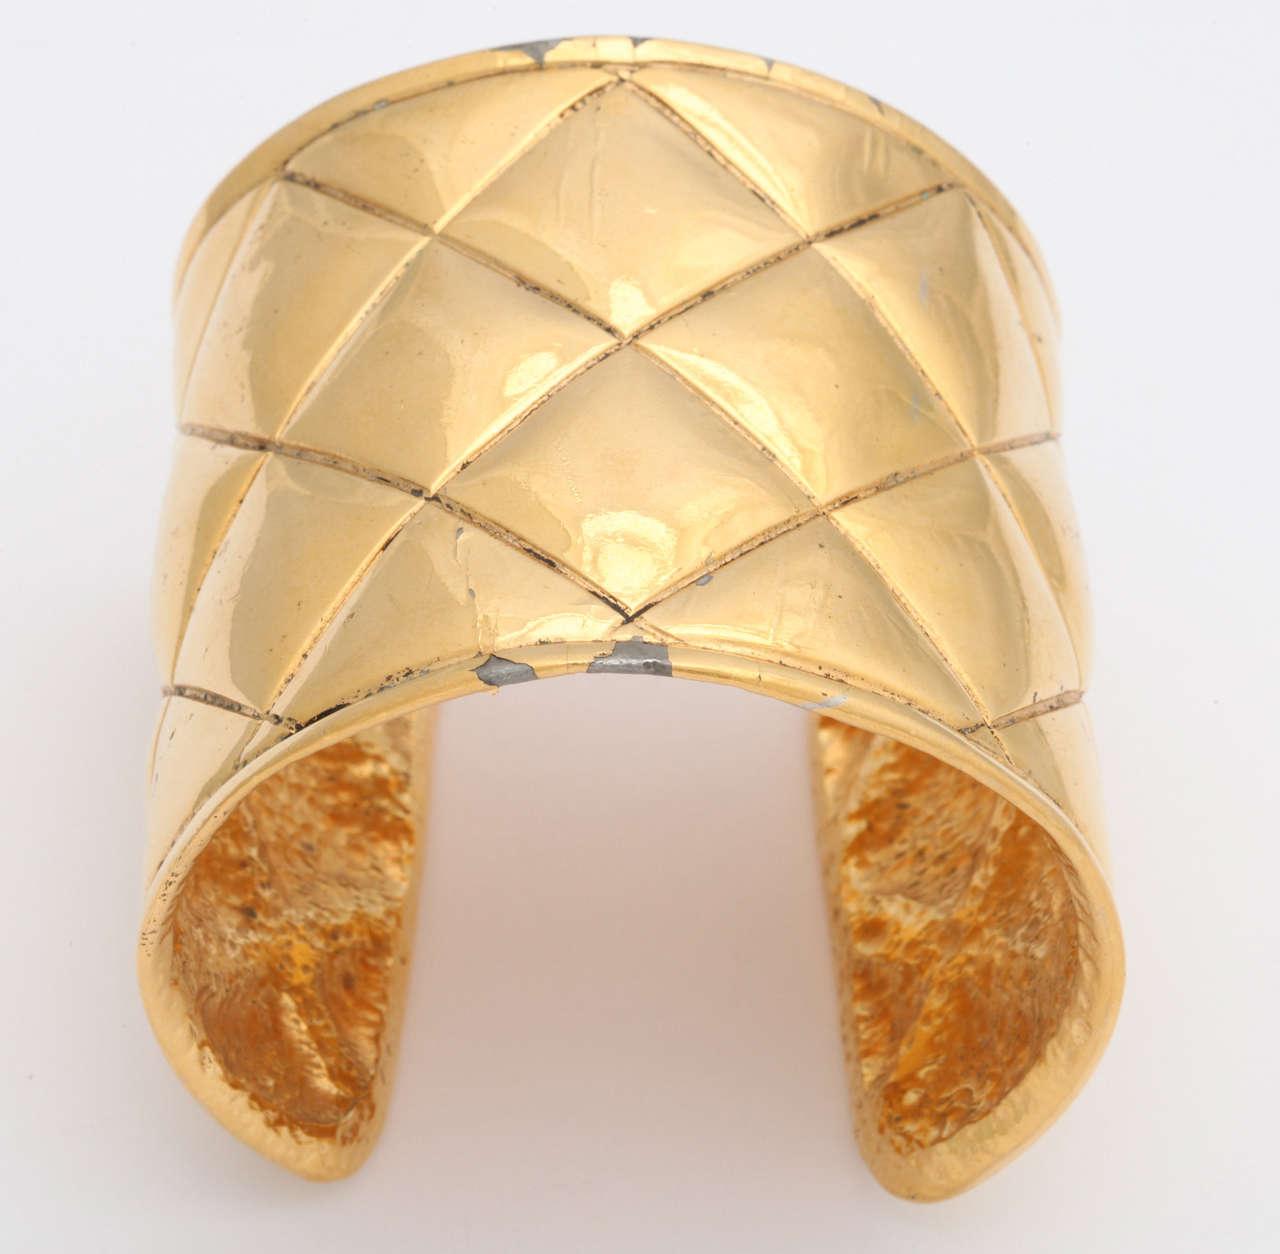 Chanel Quilted Bangle Bracelet 4